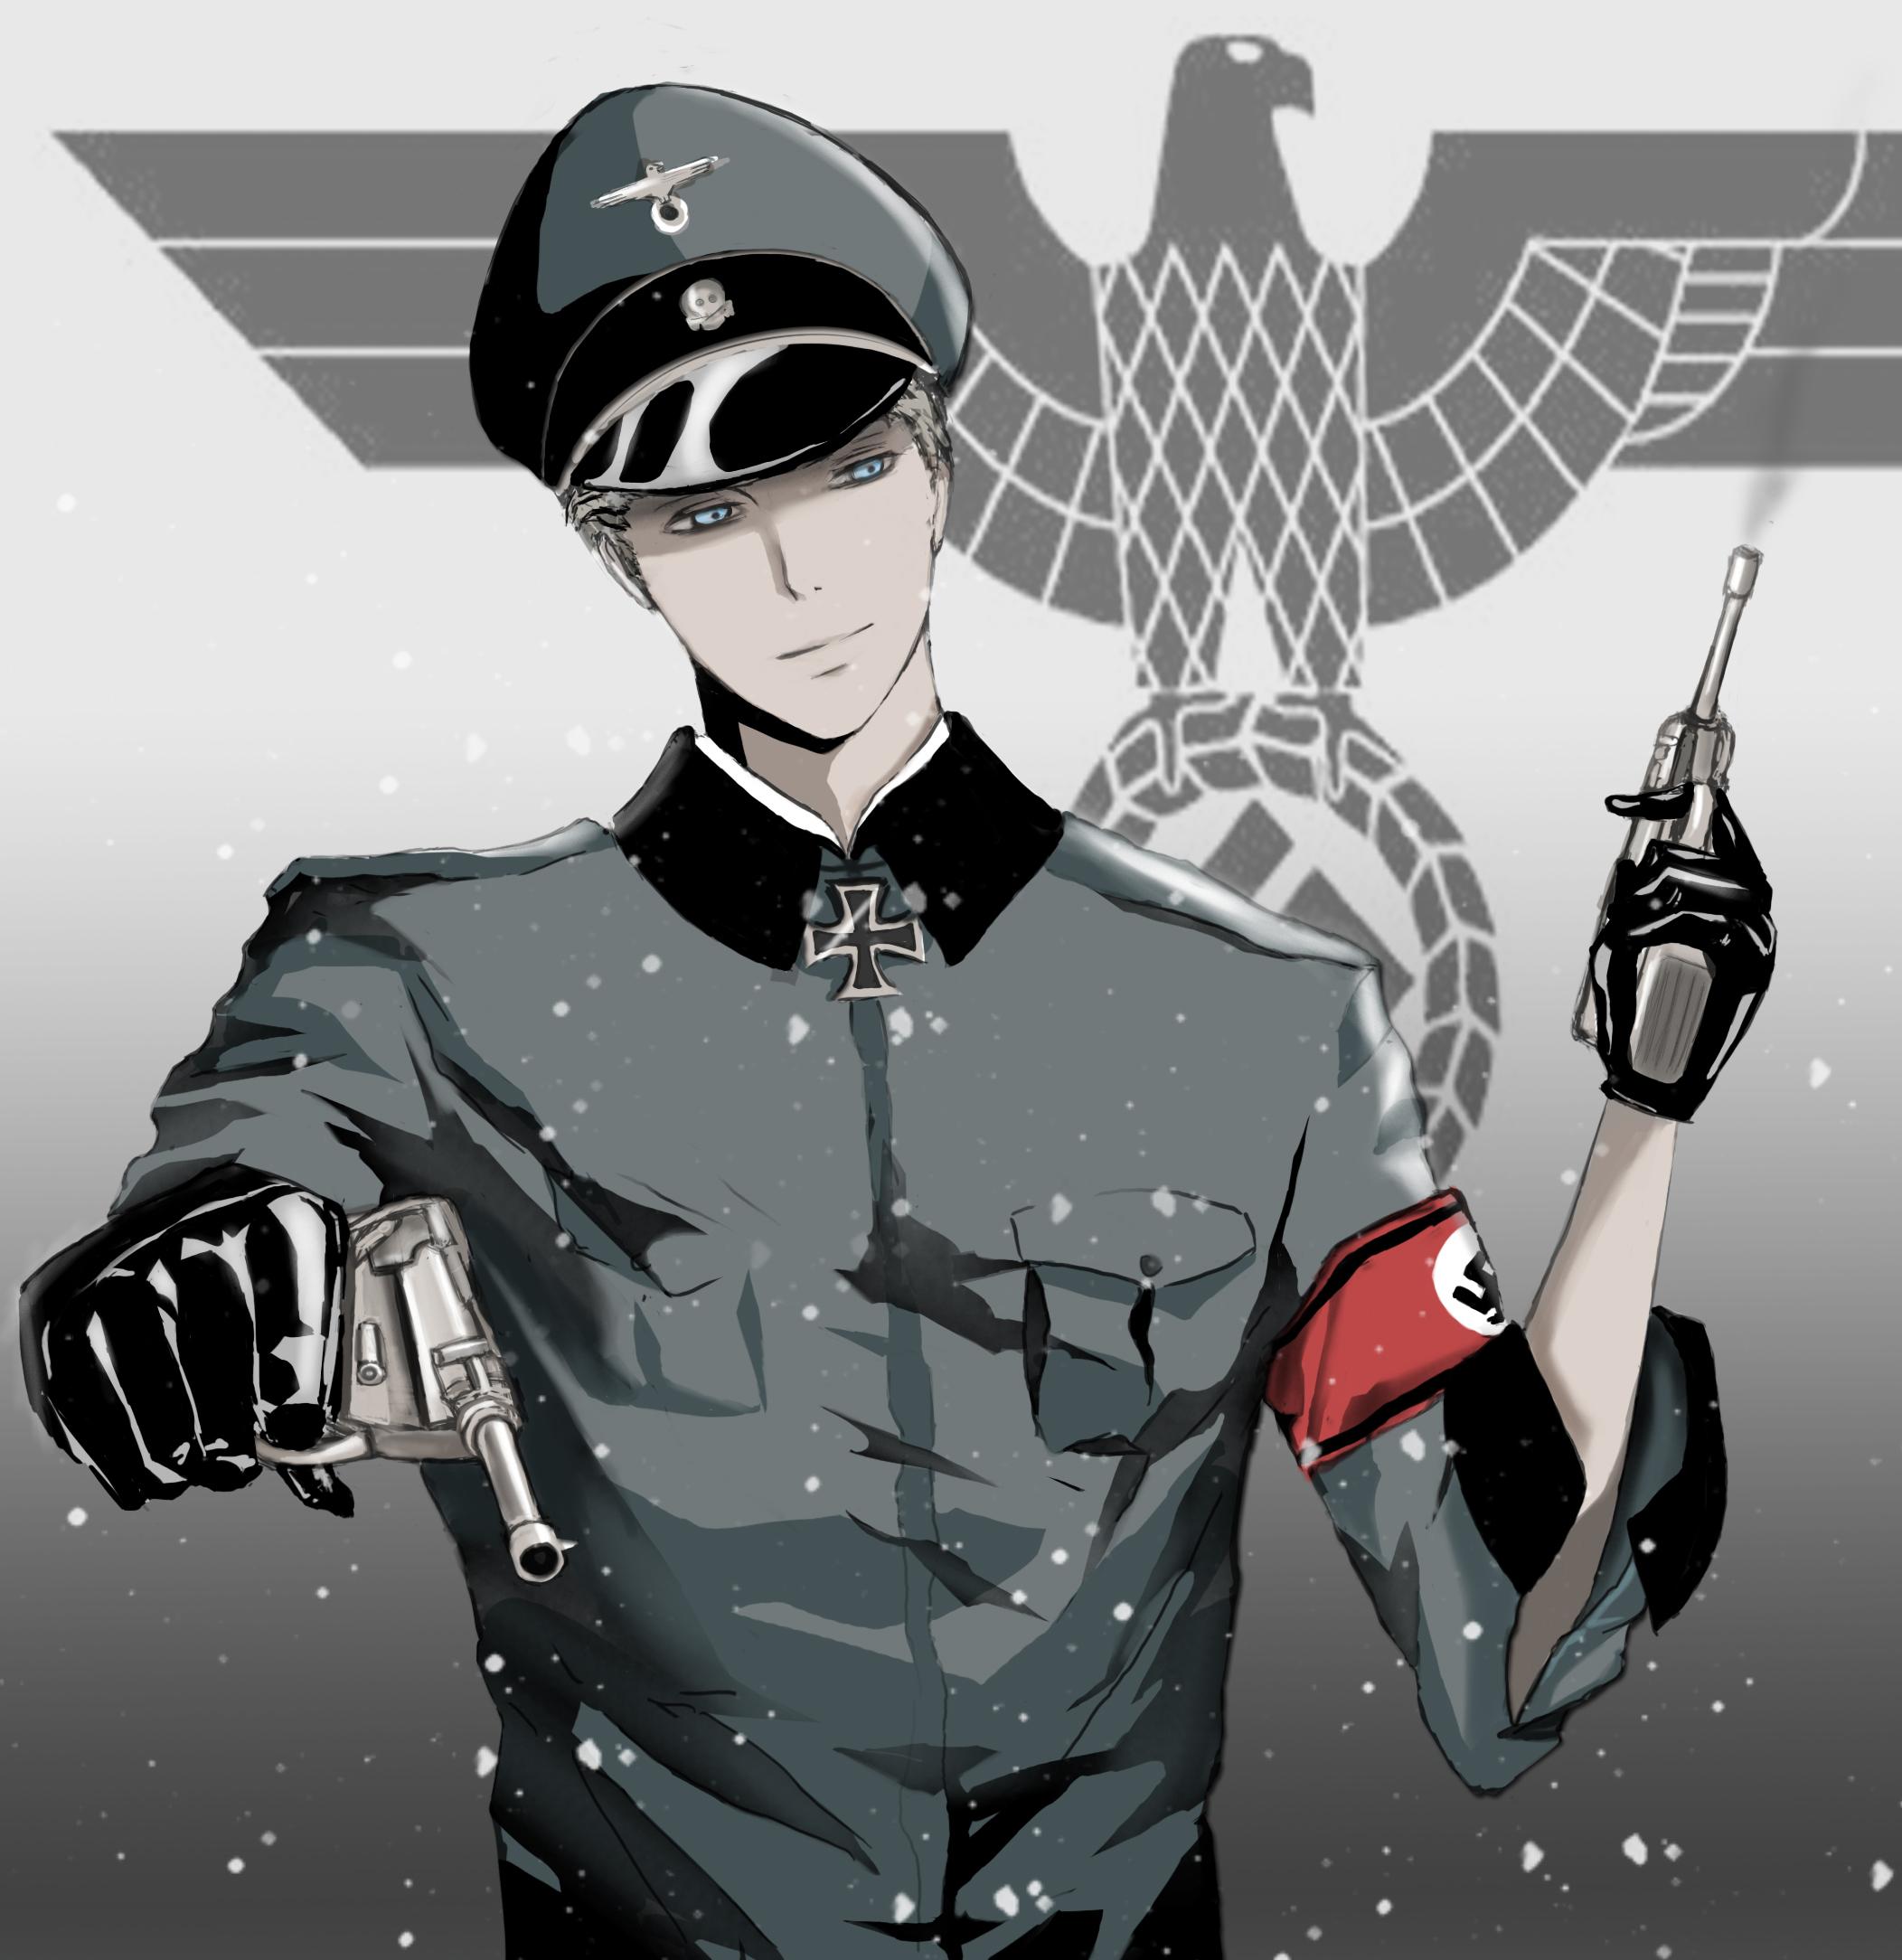 Anime germany Top 10